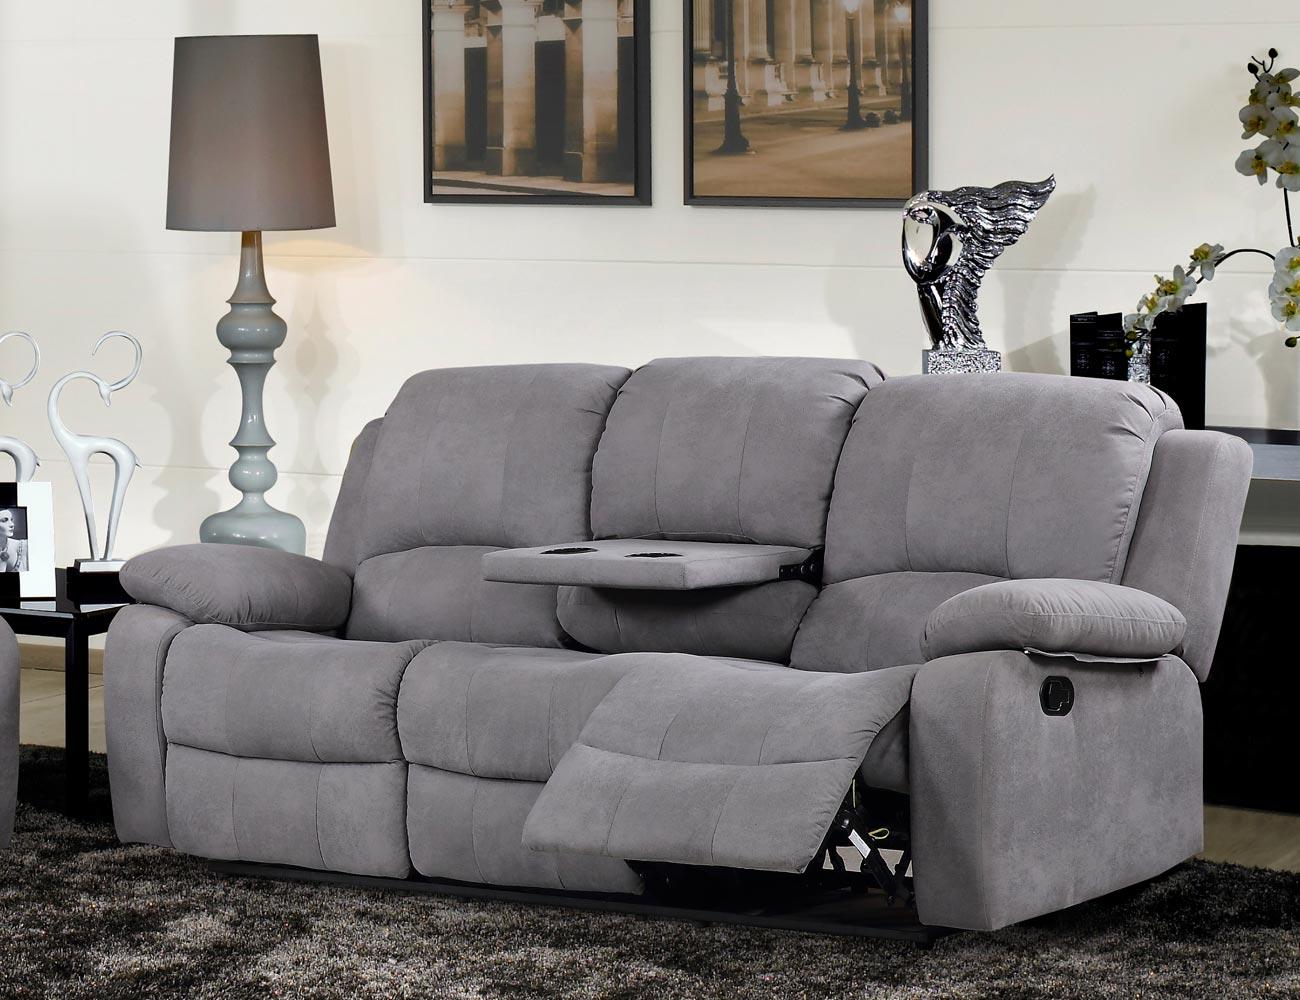 Sofa relax bandeja copas auxiliar 3 plazas2